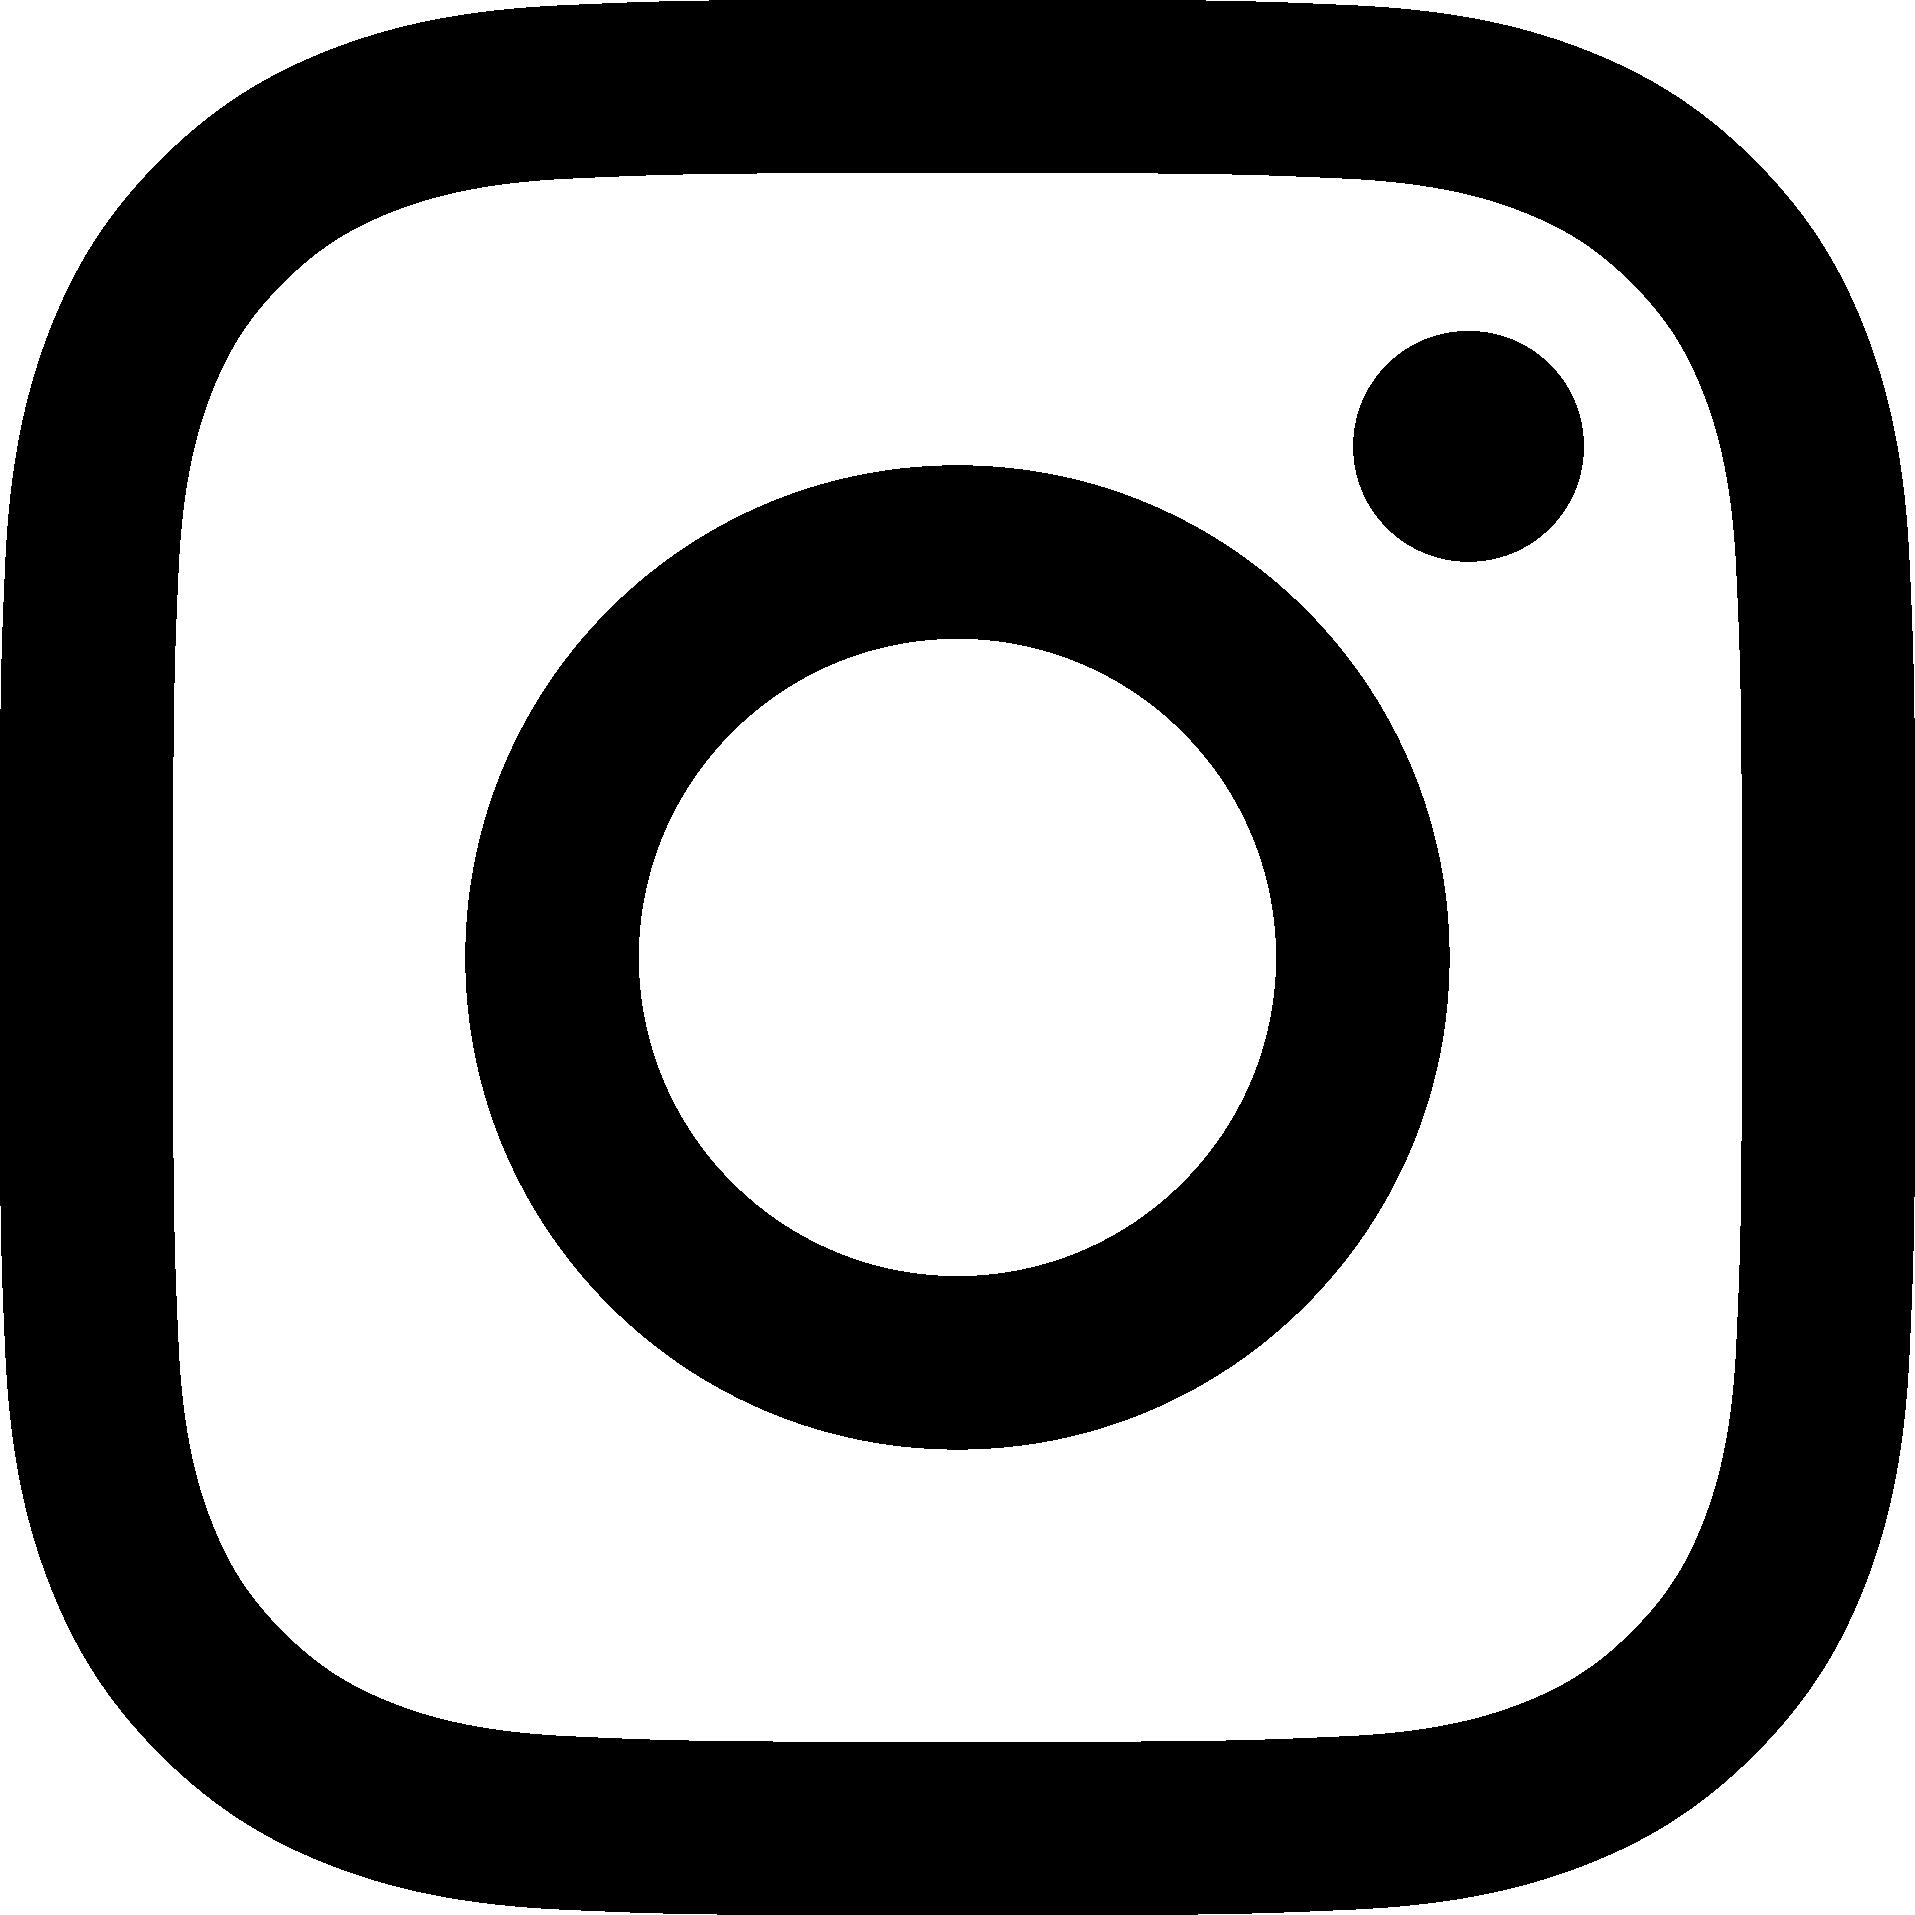 Instagram Clipart logo hq